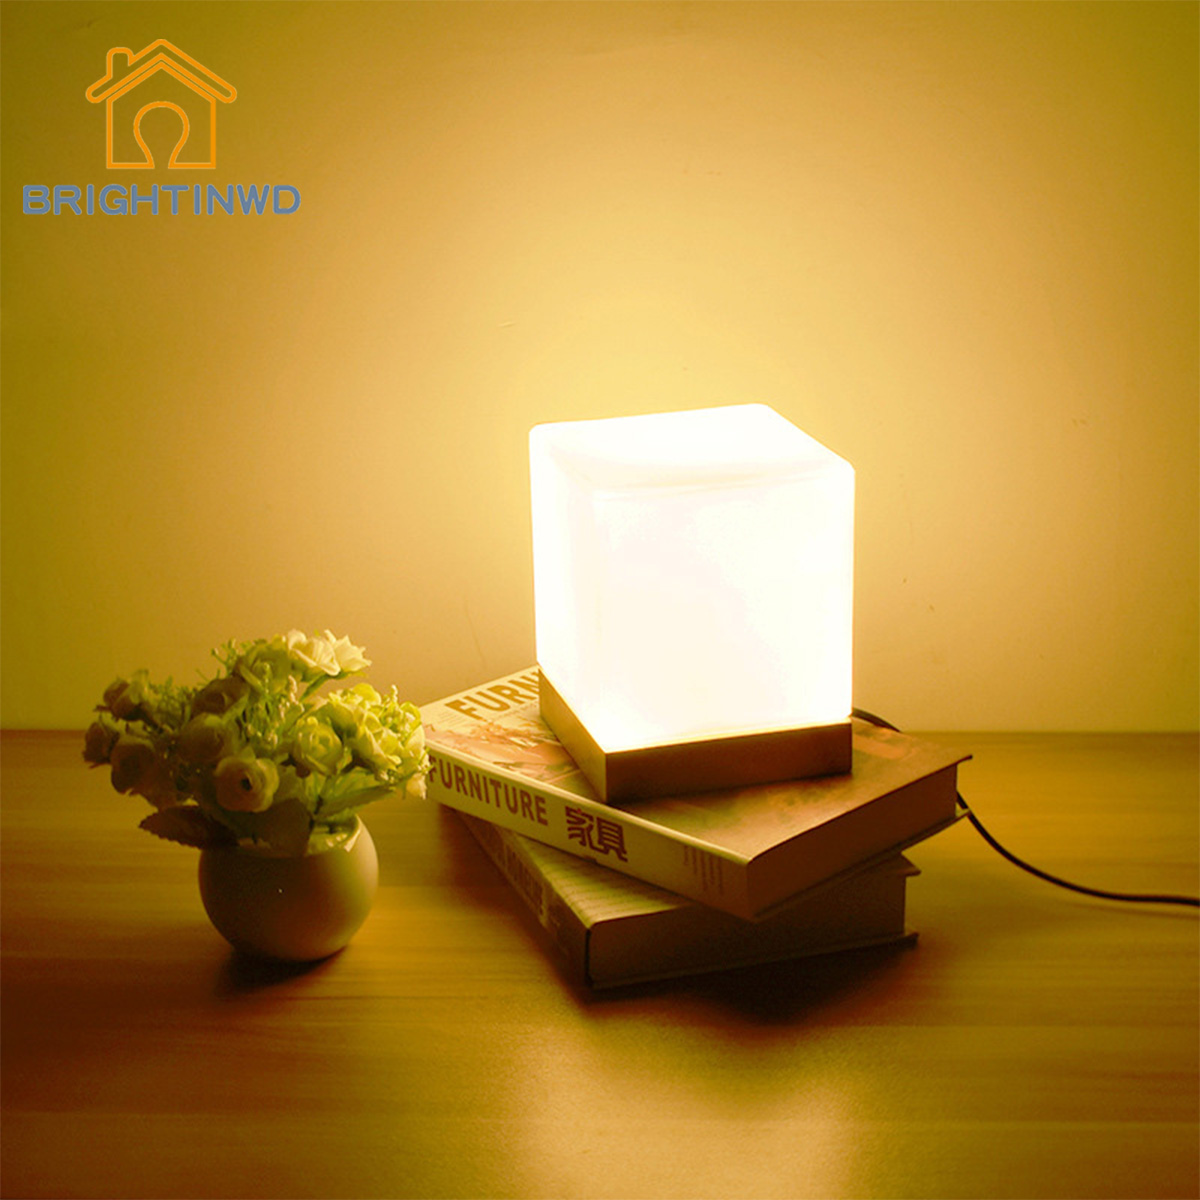 BRIGHTINWD Small Table Lamp Simple Glass Wood Warm Light Night Light Desk Bedroom Decoration Bedside Lamp